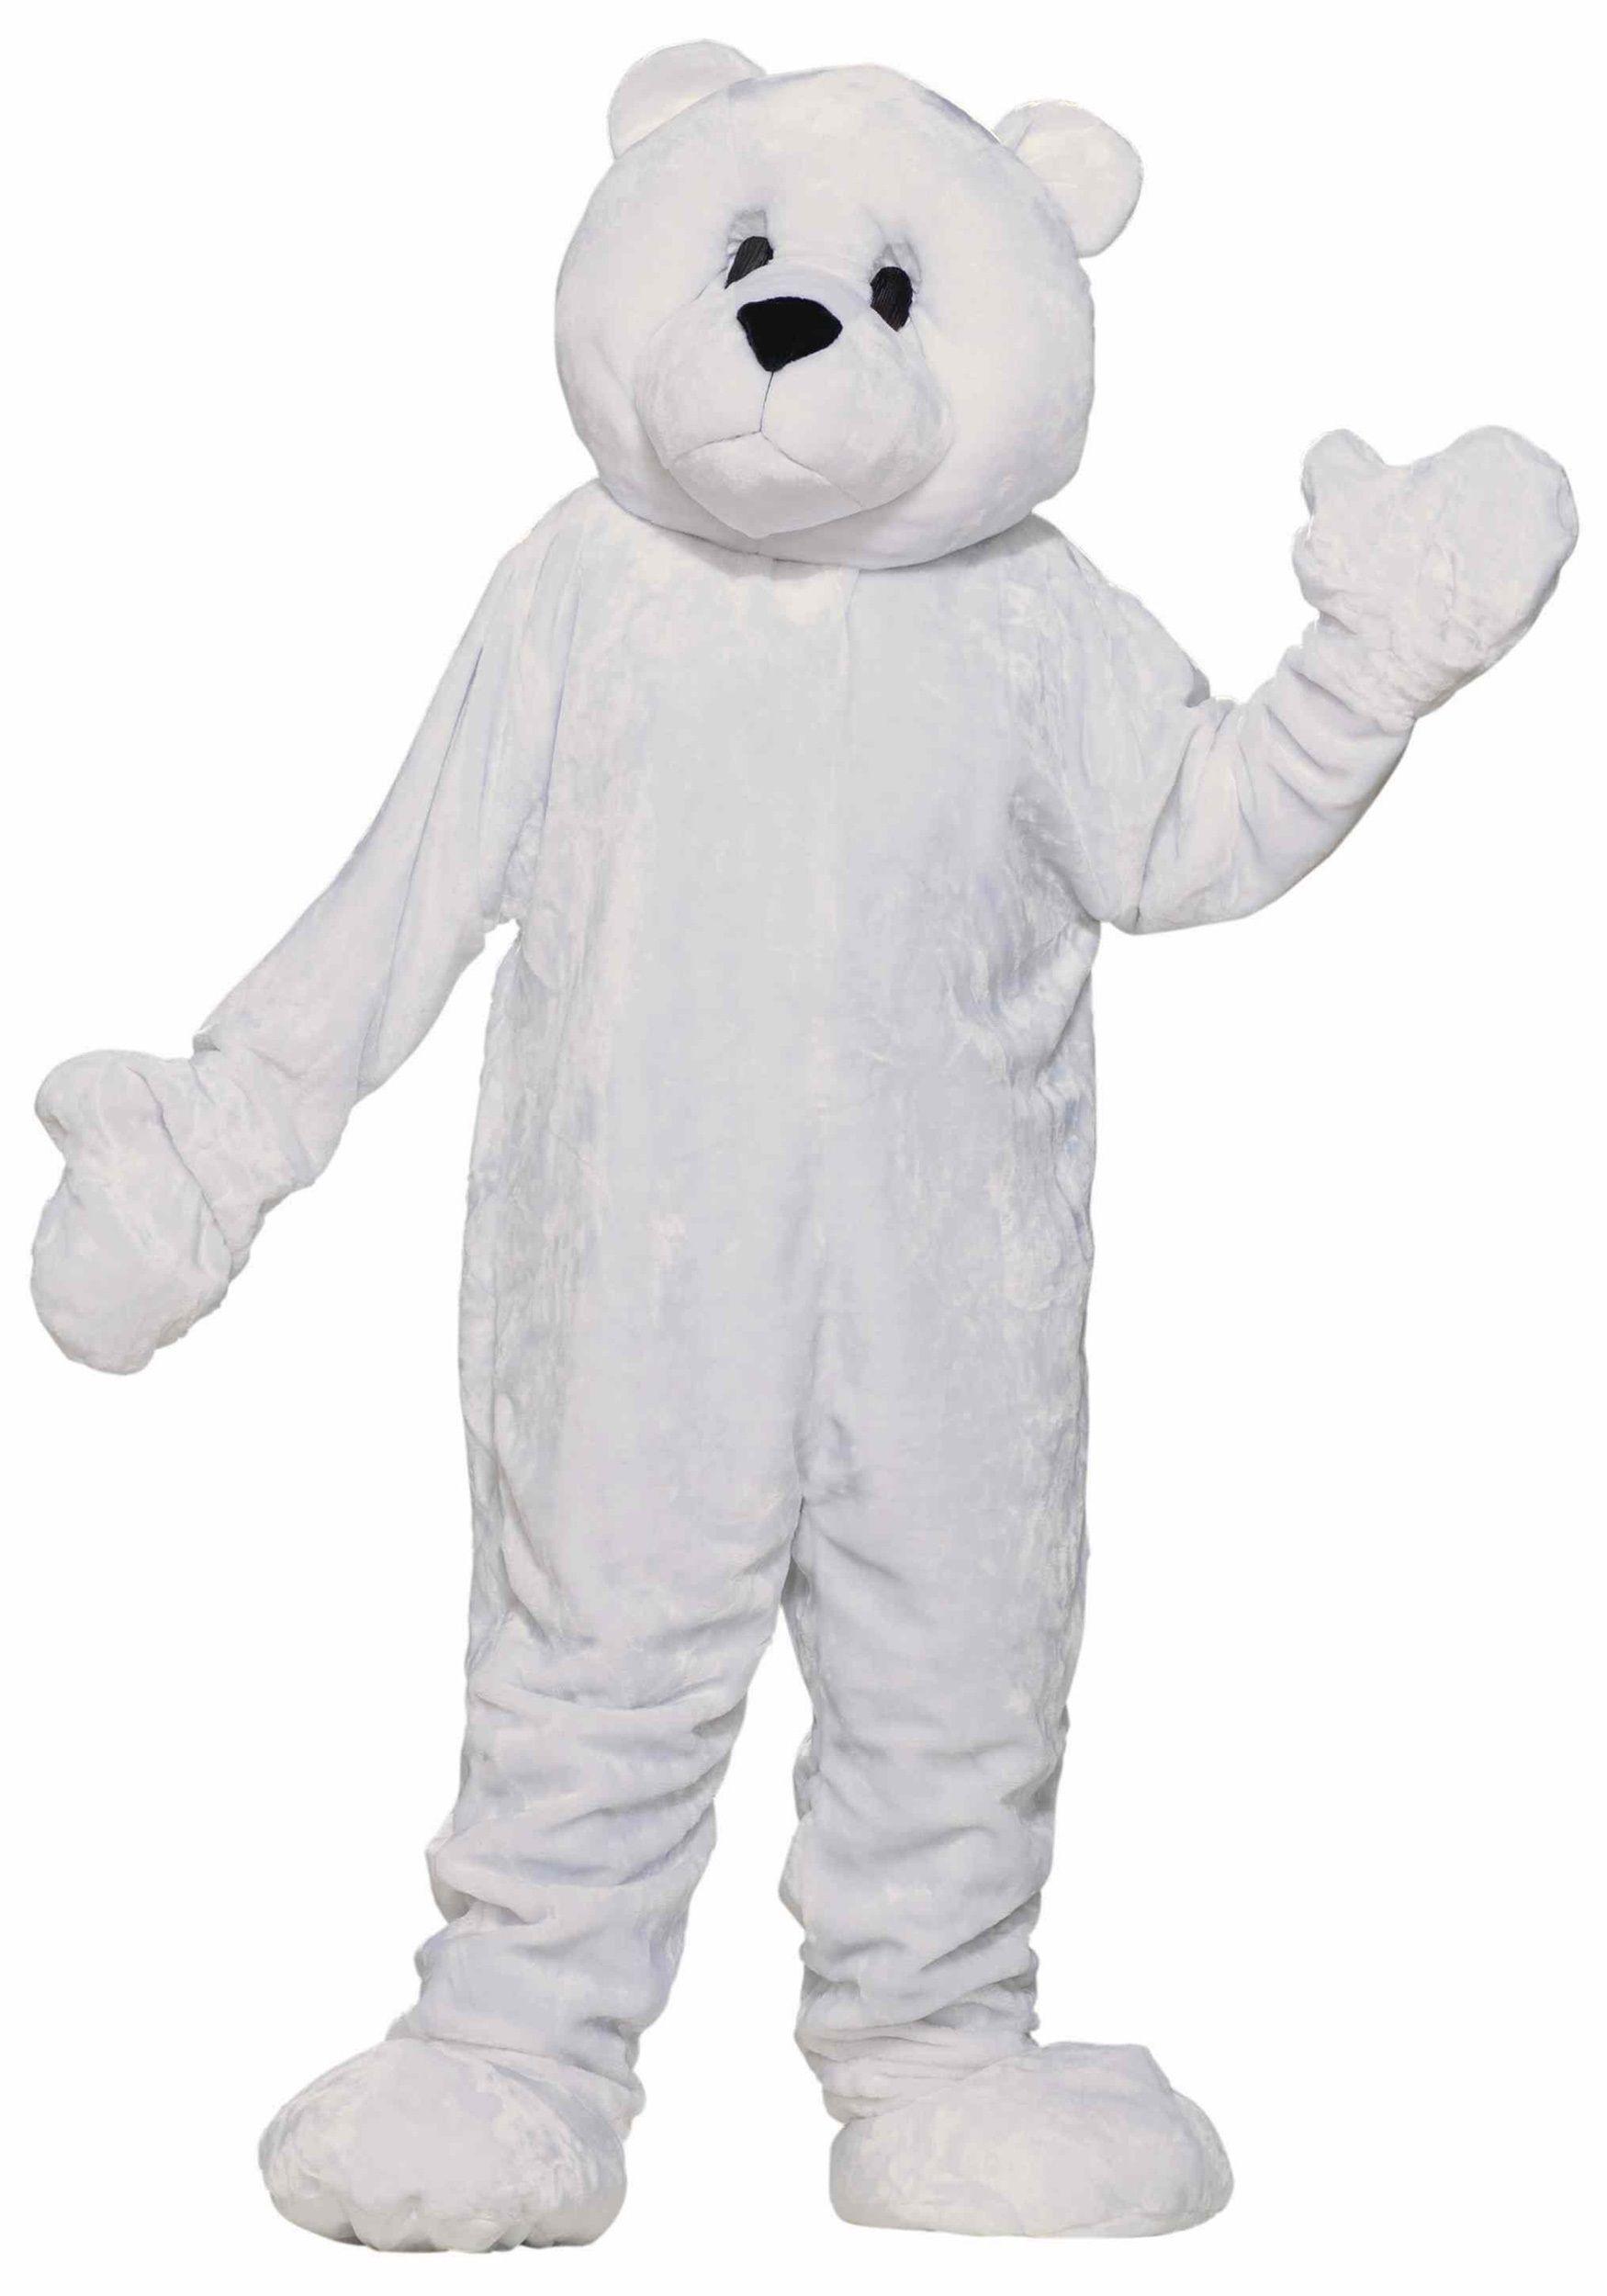 Mascot Polar Bear Costume  sc 1 st  Pinterest & Mascot Polar Bear Costume | Halloween Costume Ideas 2014 | Pinterest ...